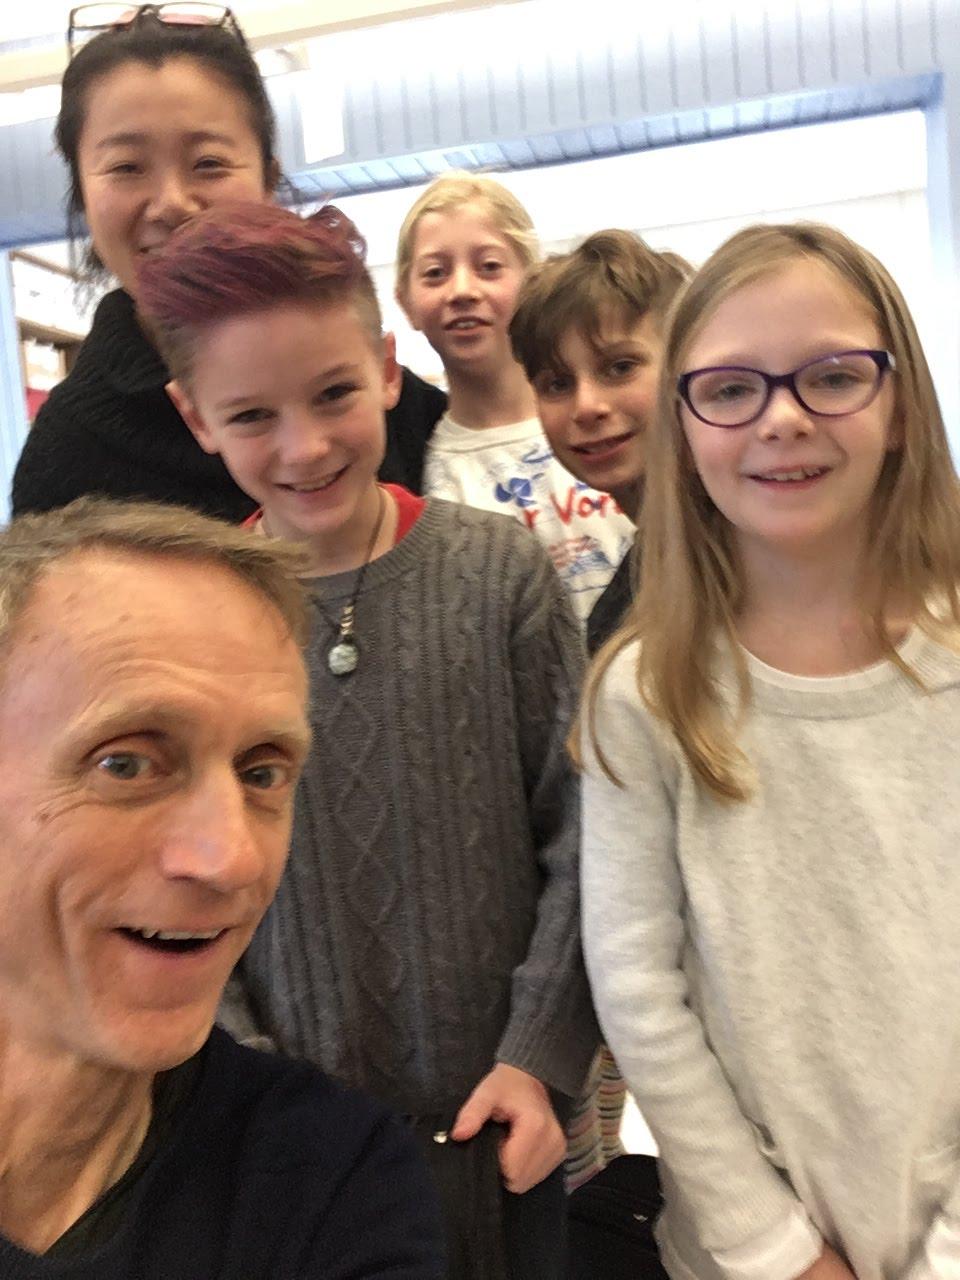 Woodstock Elementary School 12:50 violin class